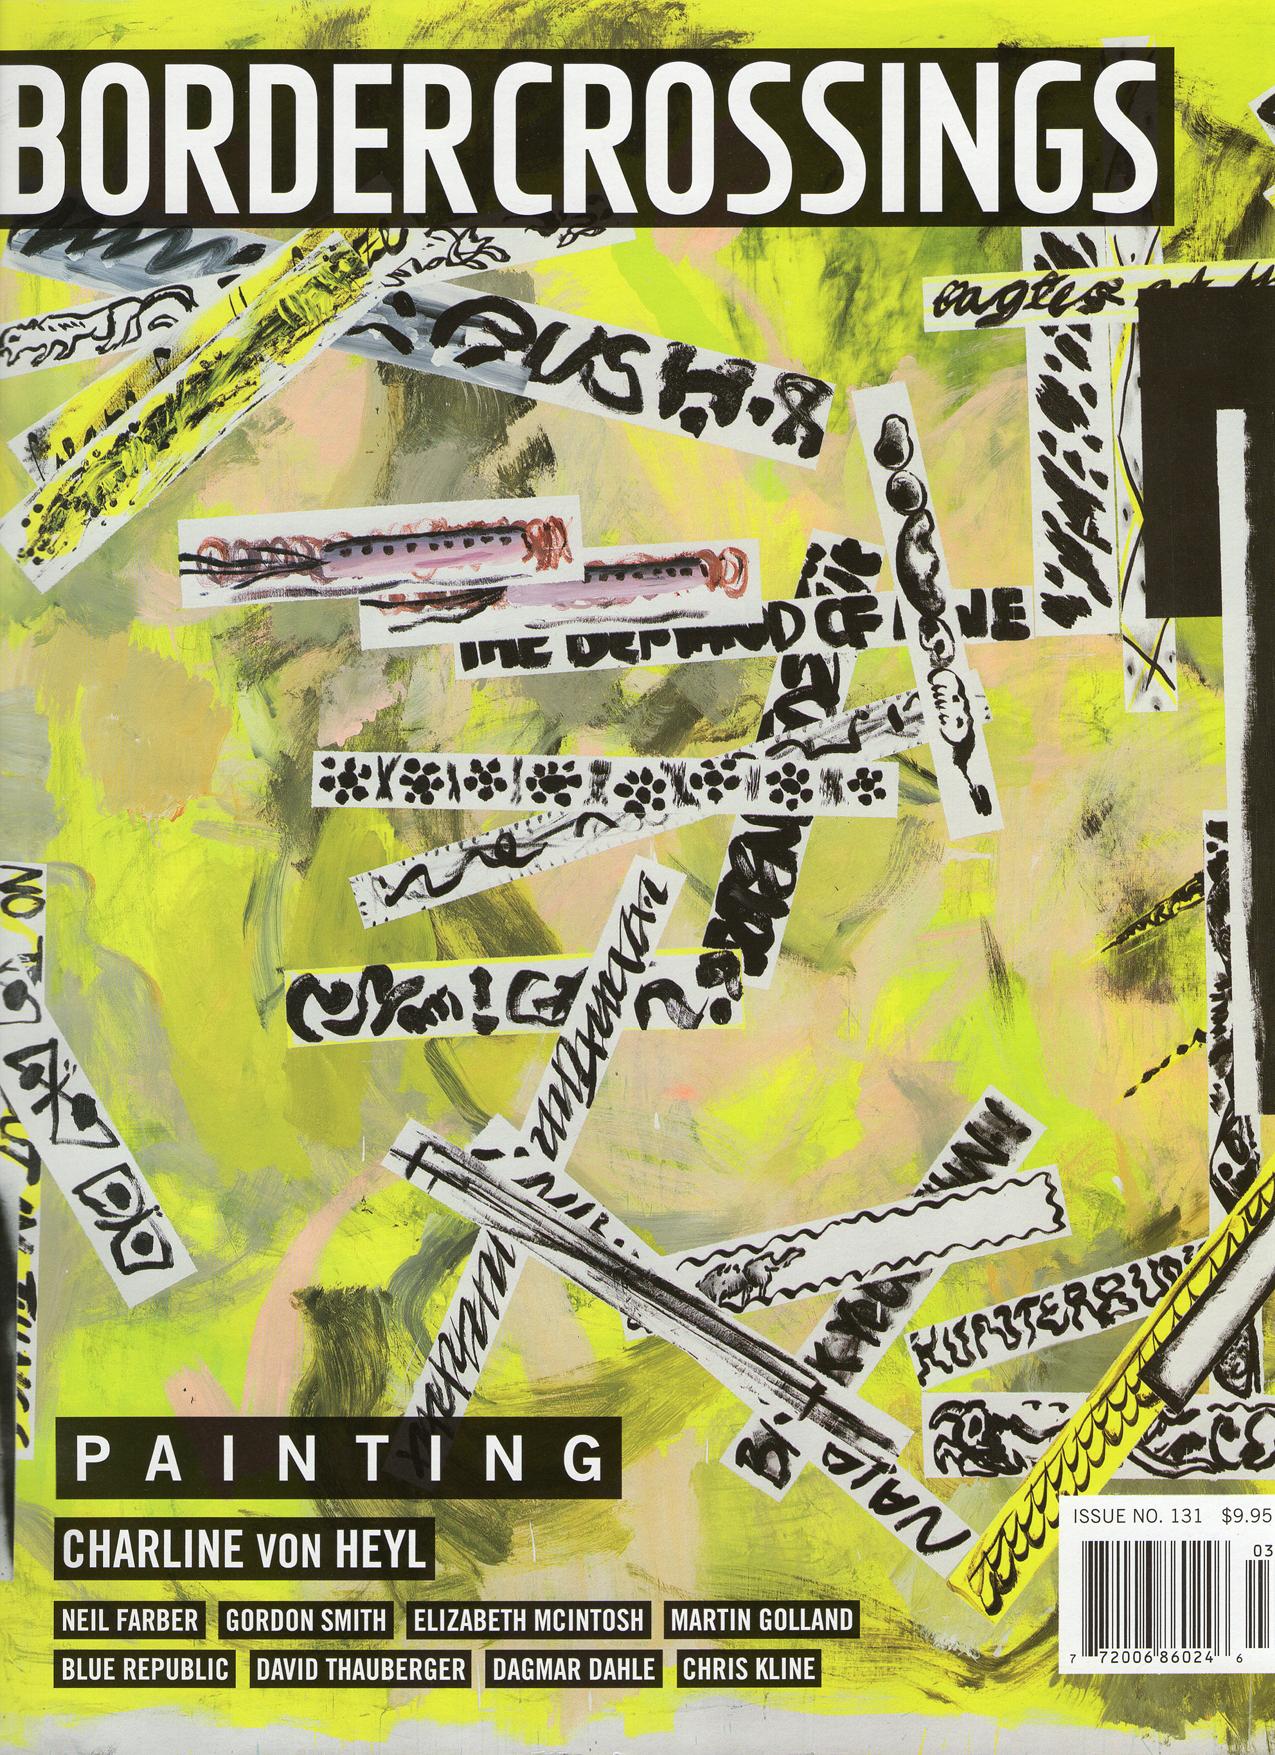 Border Crossings: Painting- Issue 131 - September 2014